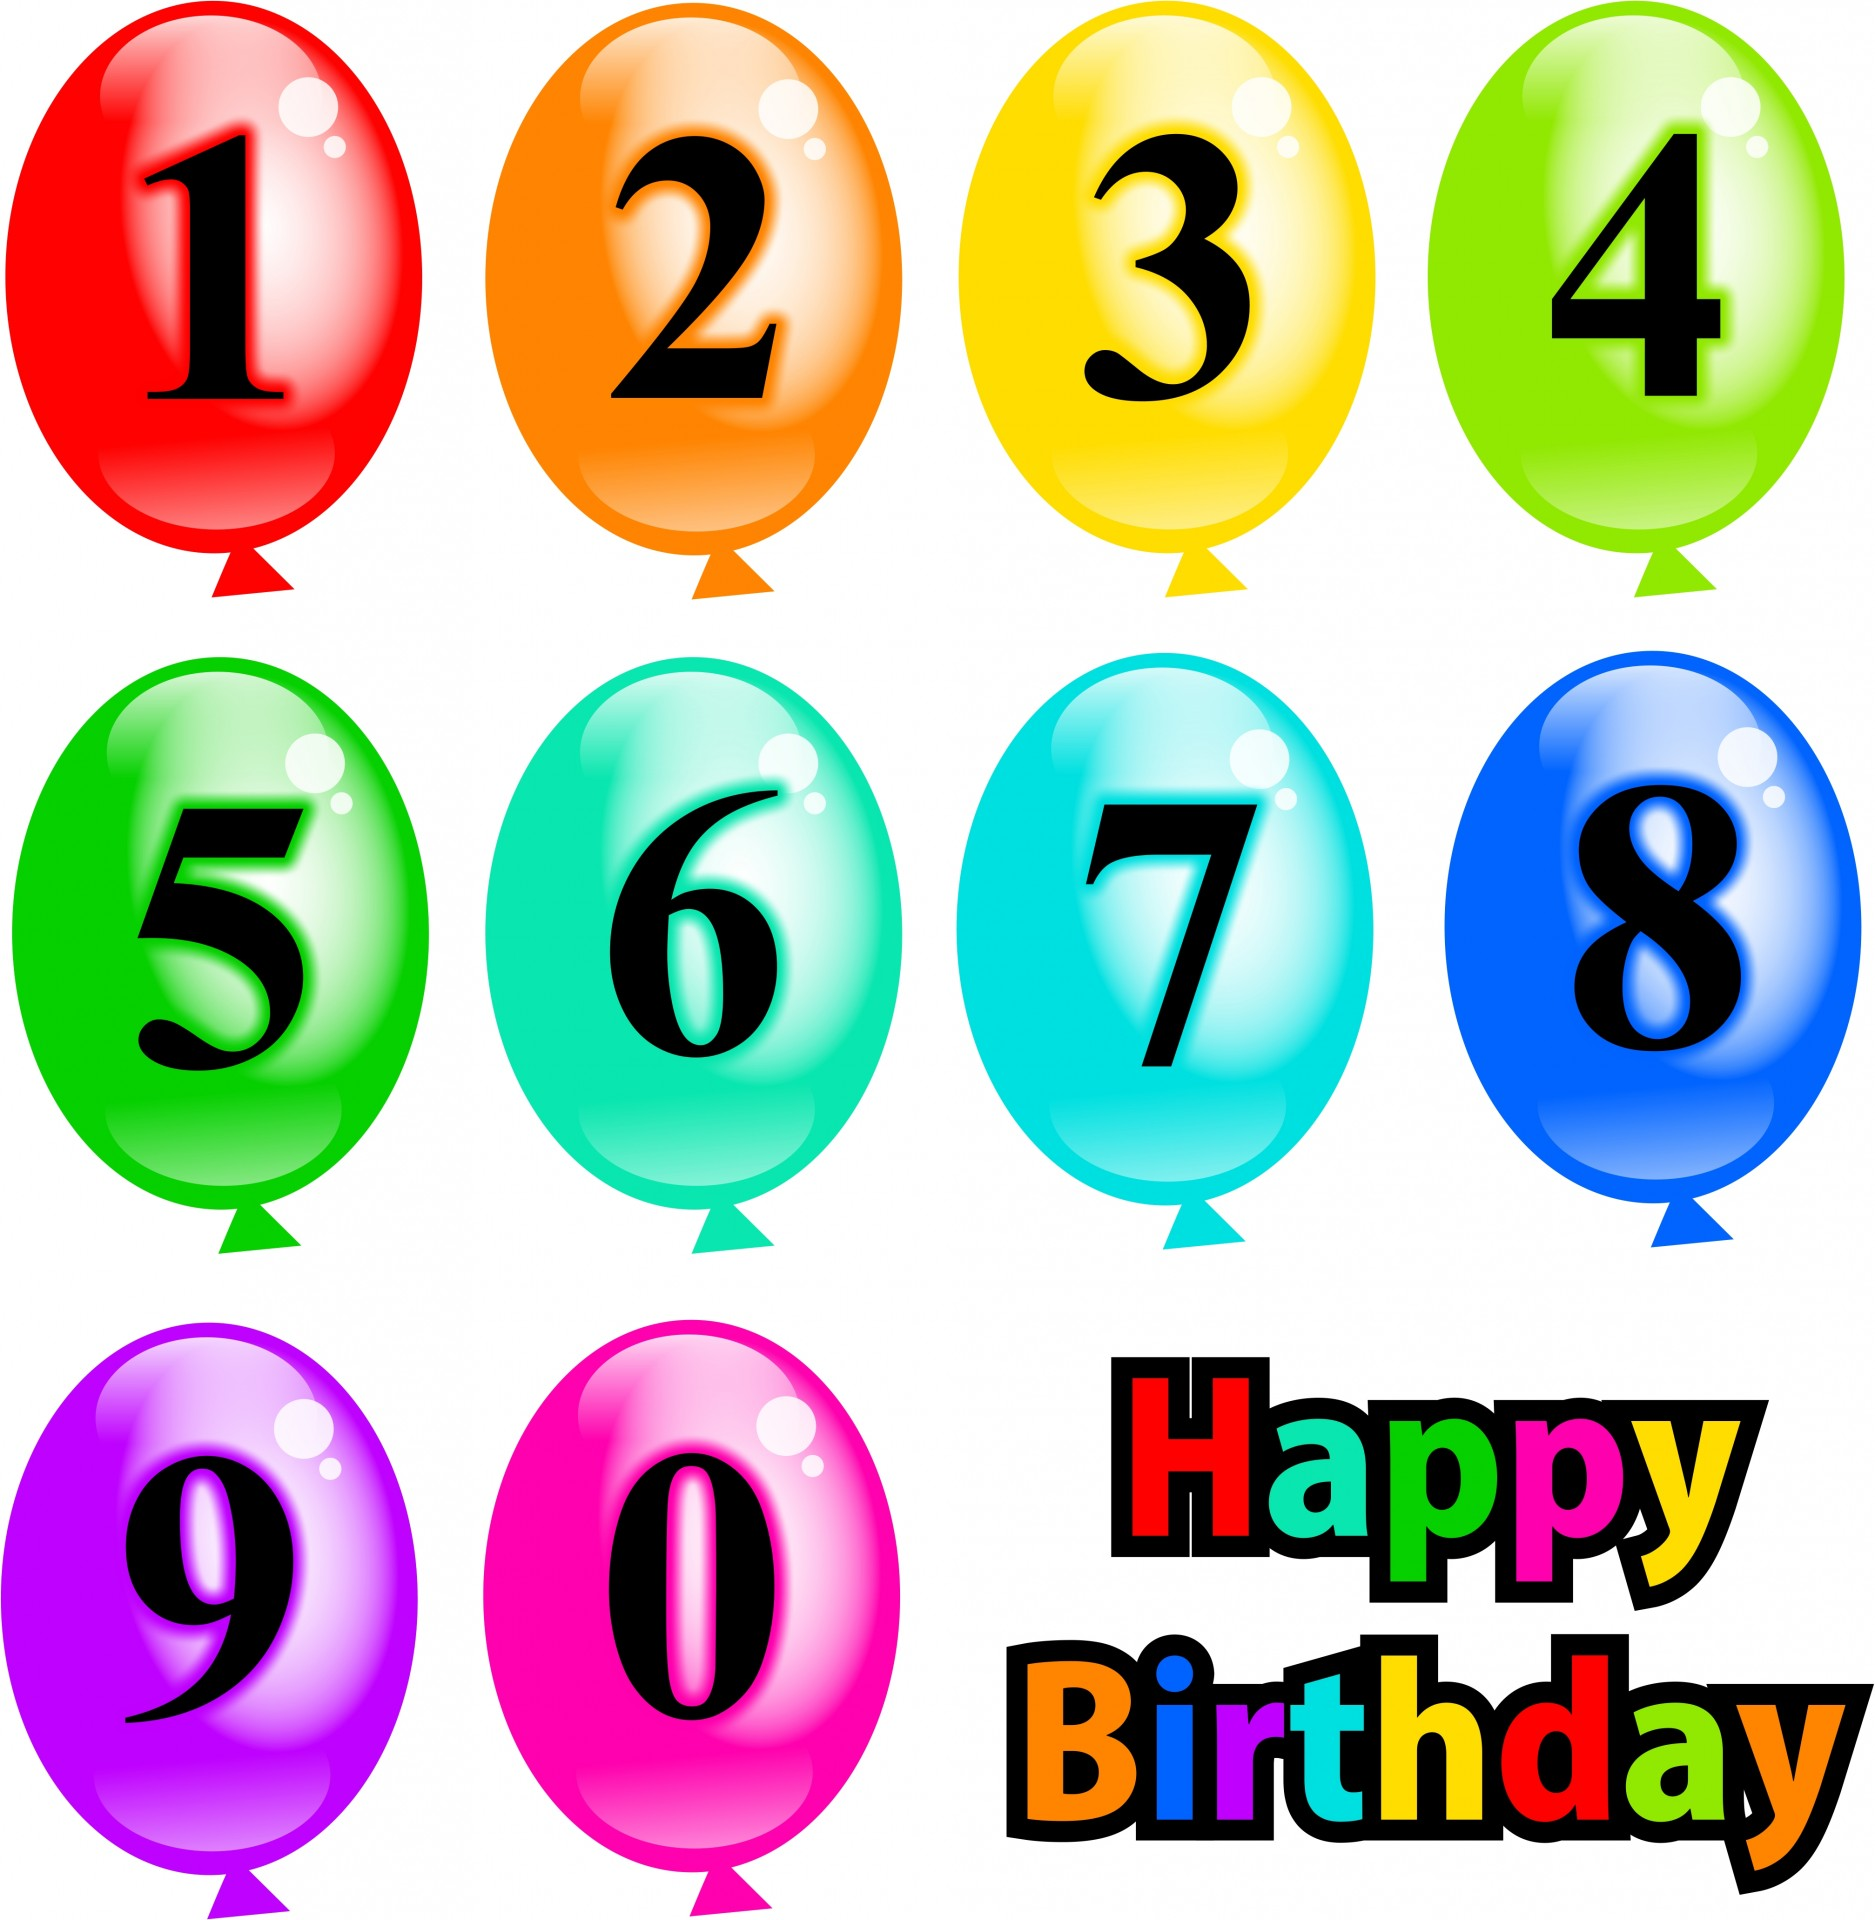 1875x1920 Birthday Balloons Clipart Free Stock Photo